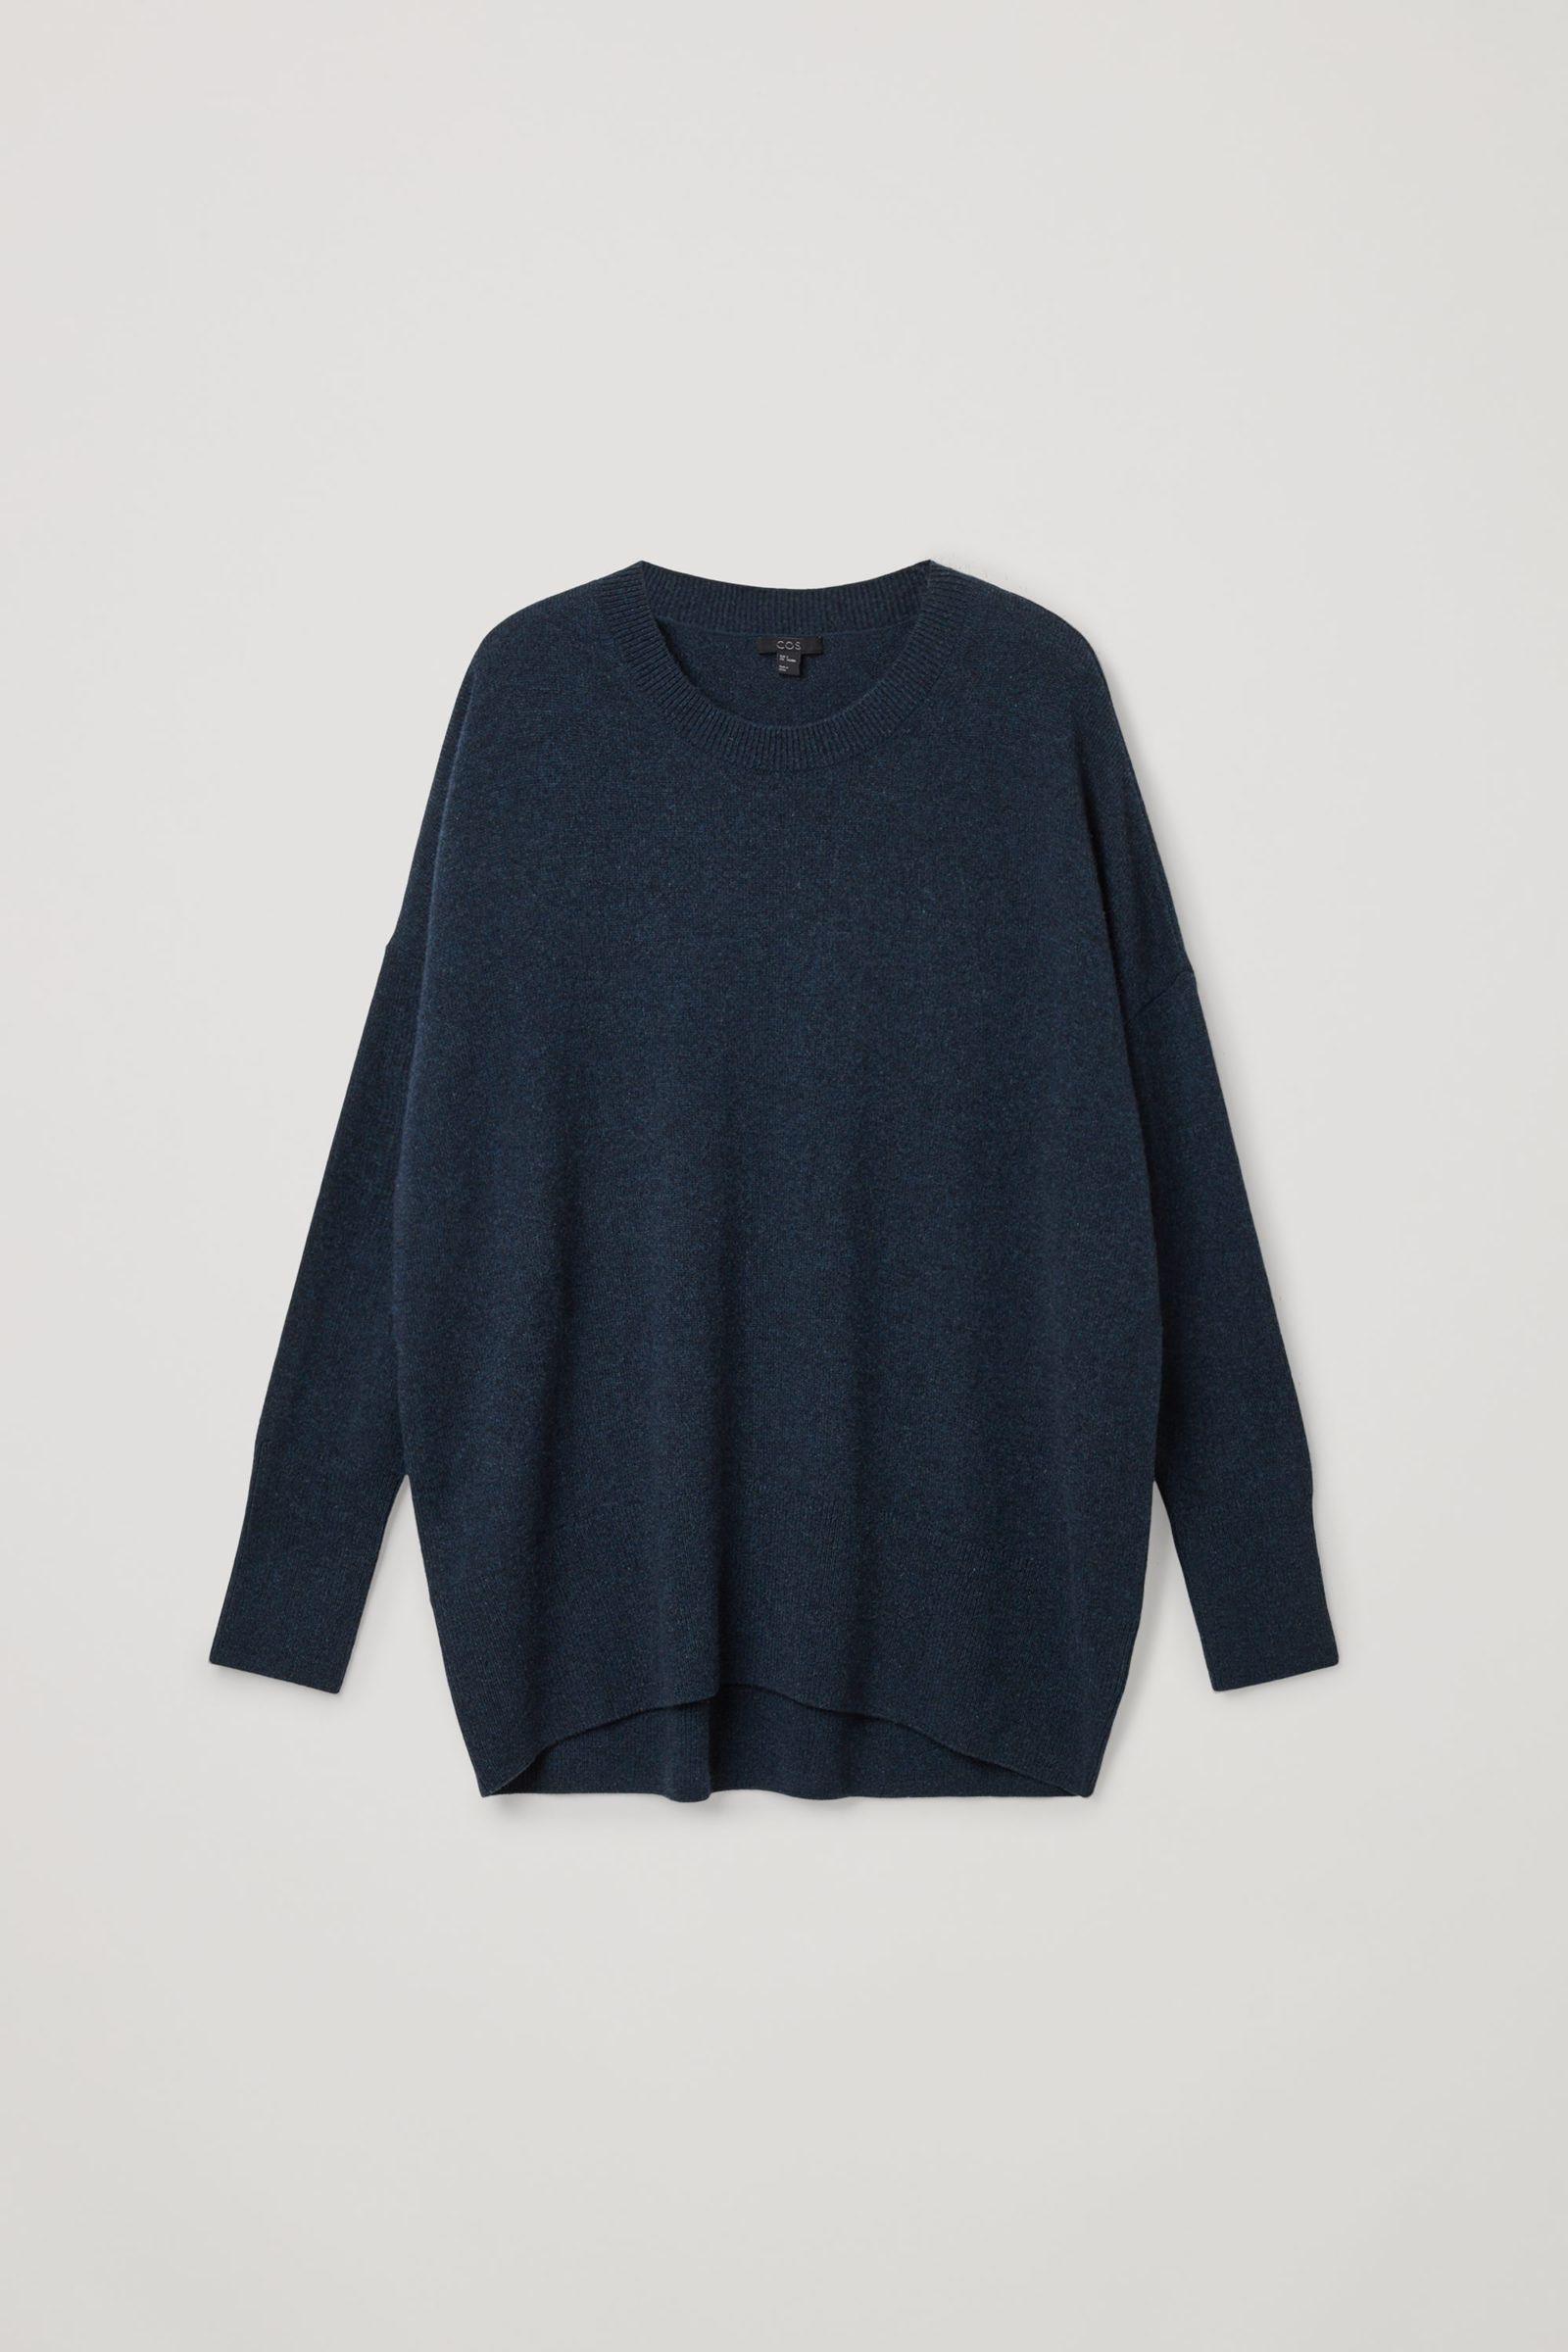 COS 캐시미어 오버사이즈 스웨터의 네이비컬러 Product입니다.